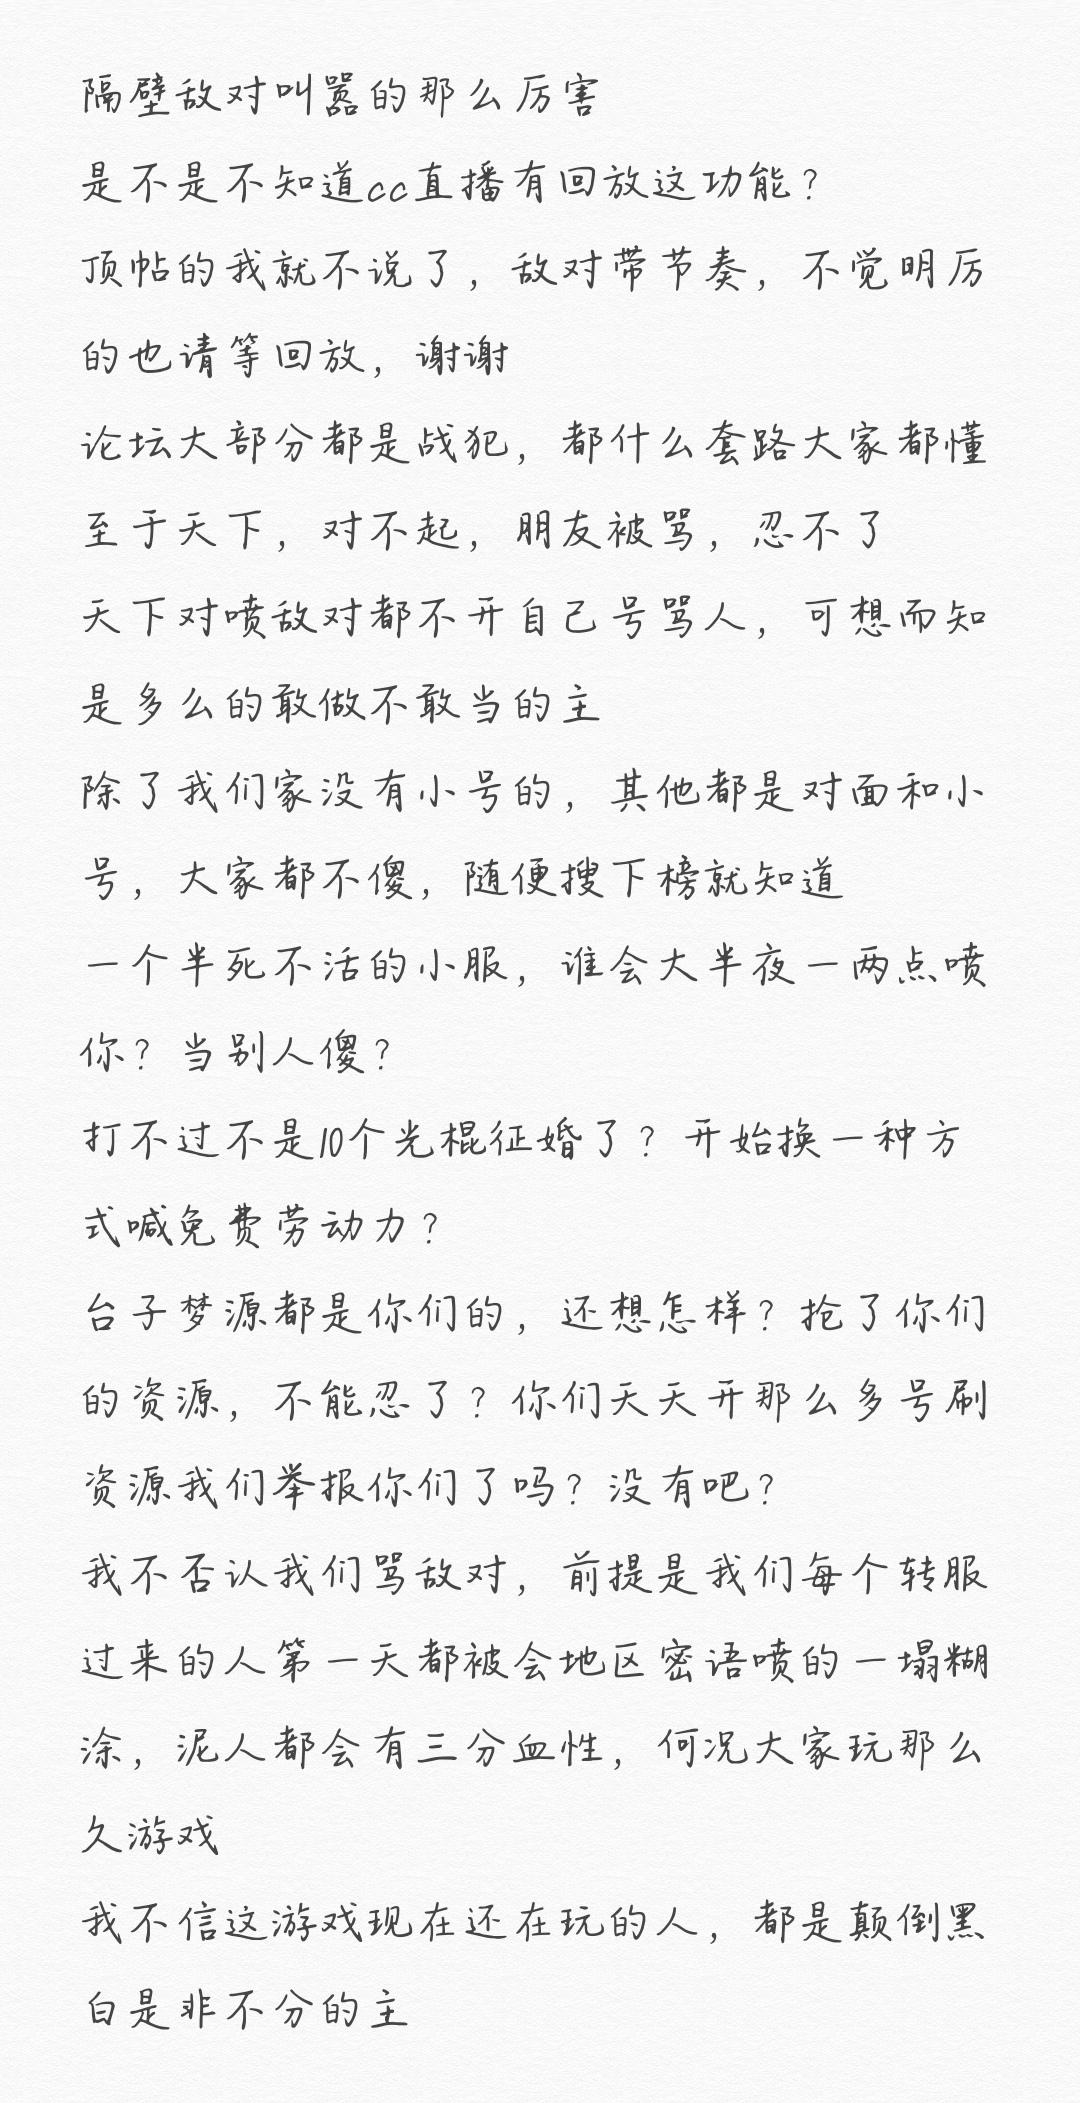 Screenshot_20210423_021705_cn.wps.note_edit_930290543202318.jpg